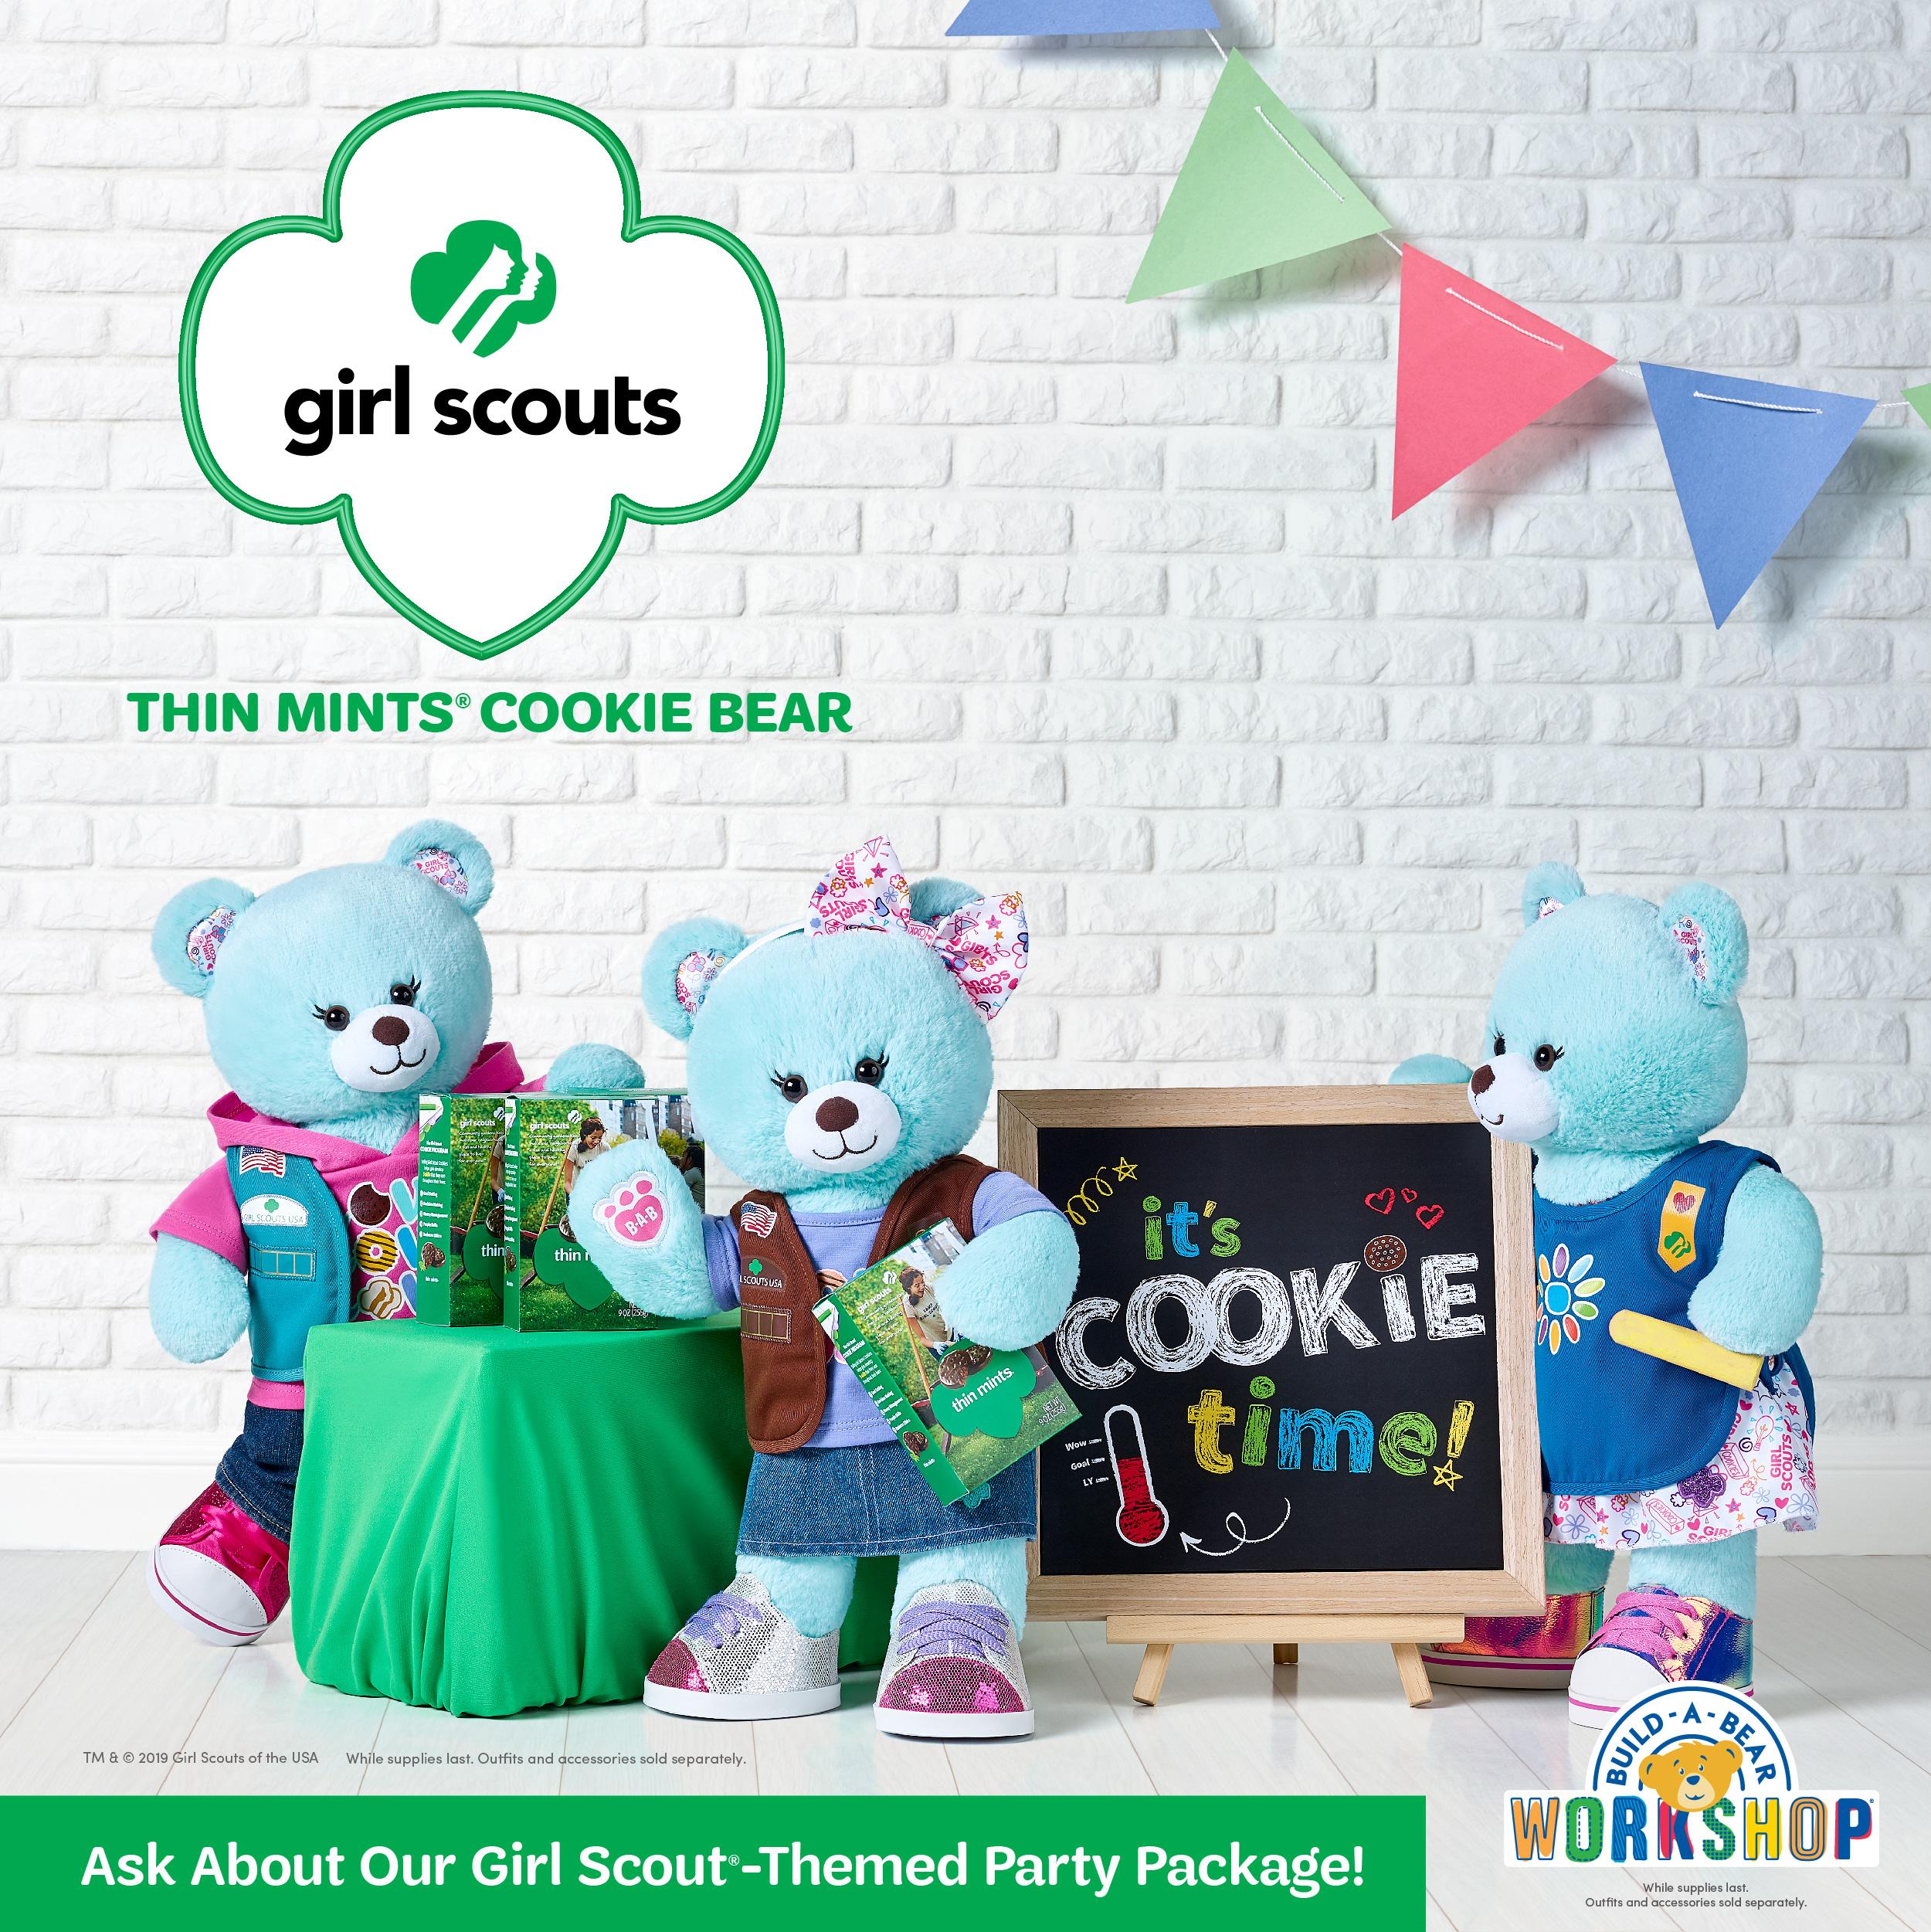 GirlScouts_February Mall Image (2).jpg